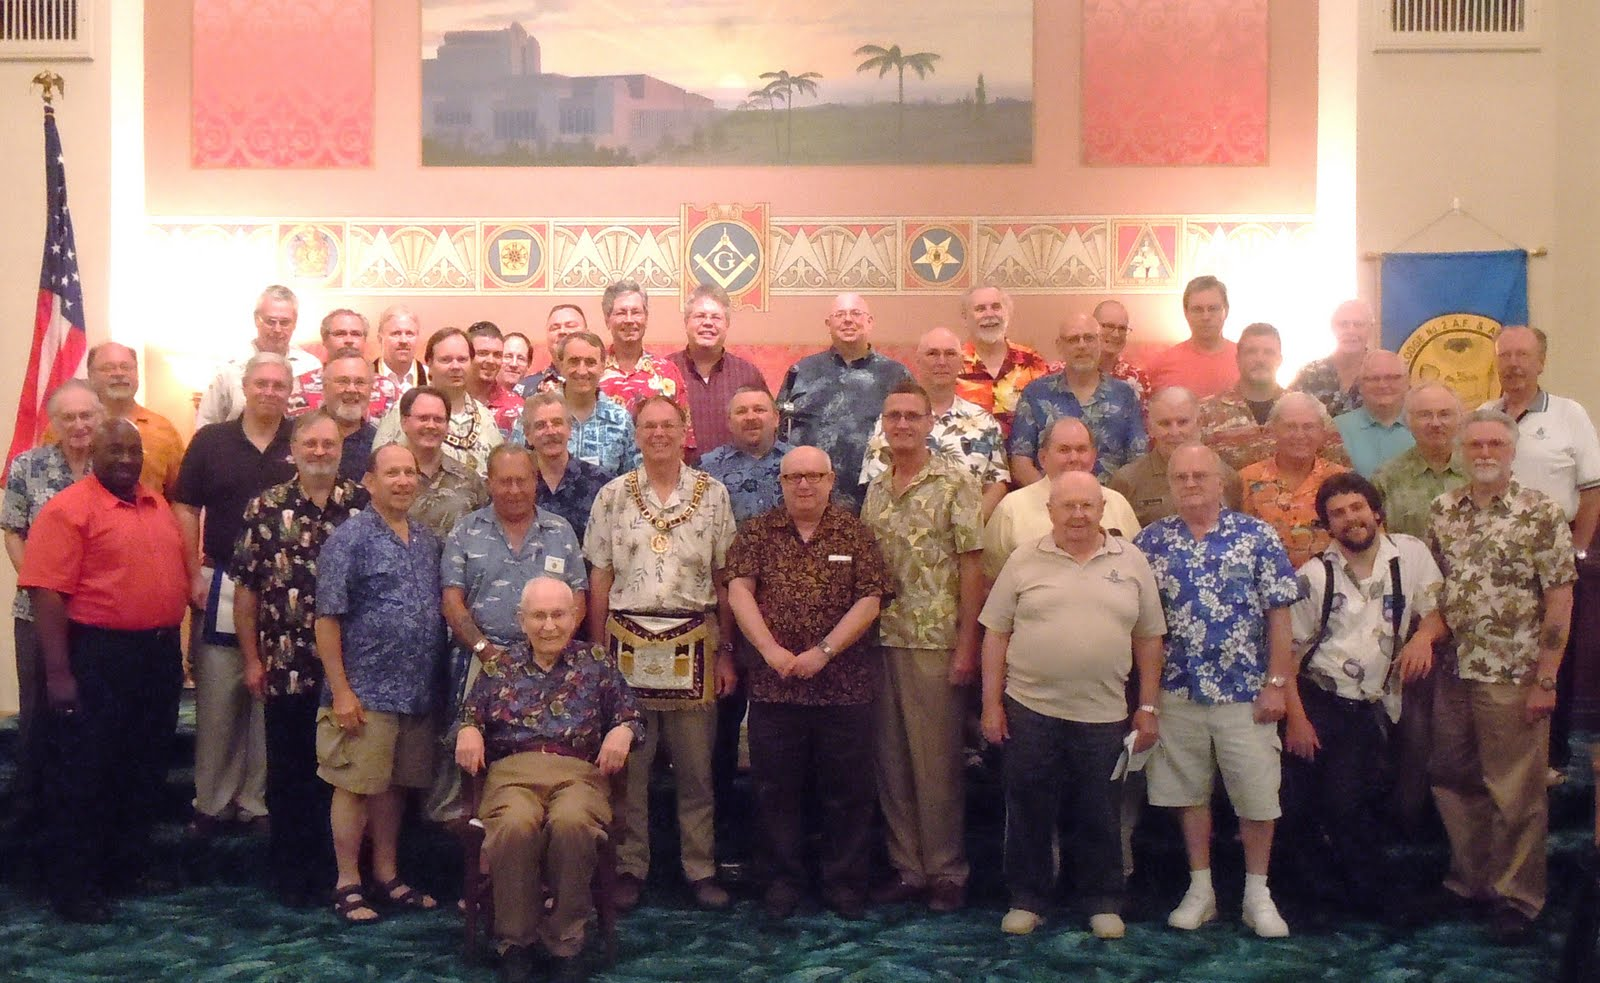 1967dc23a All Things Masonic: Hawaiian Shirt Night